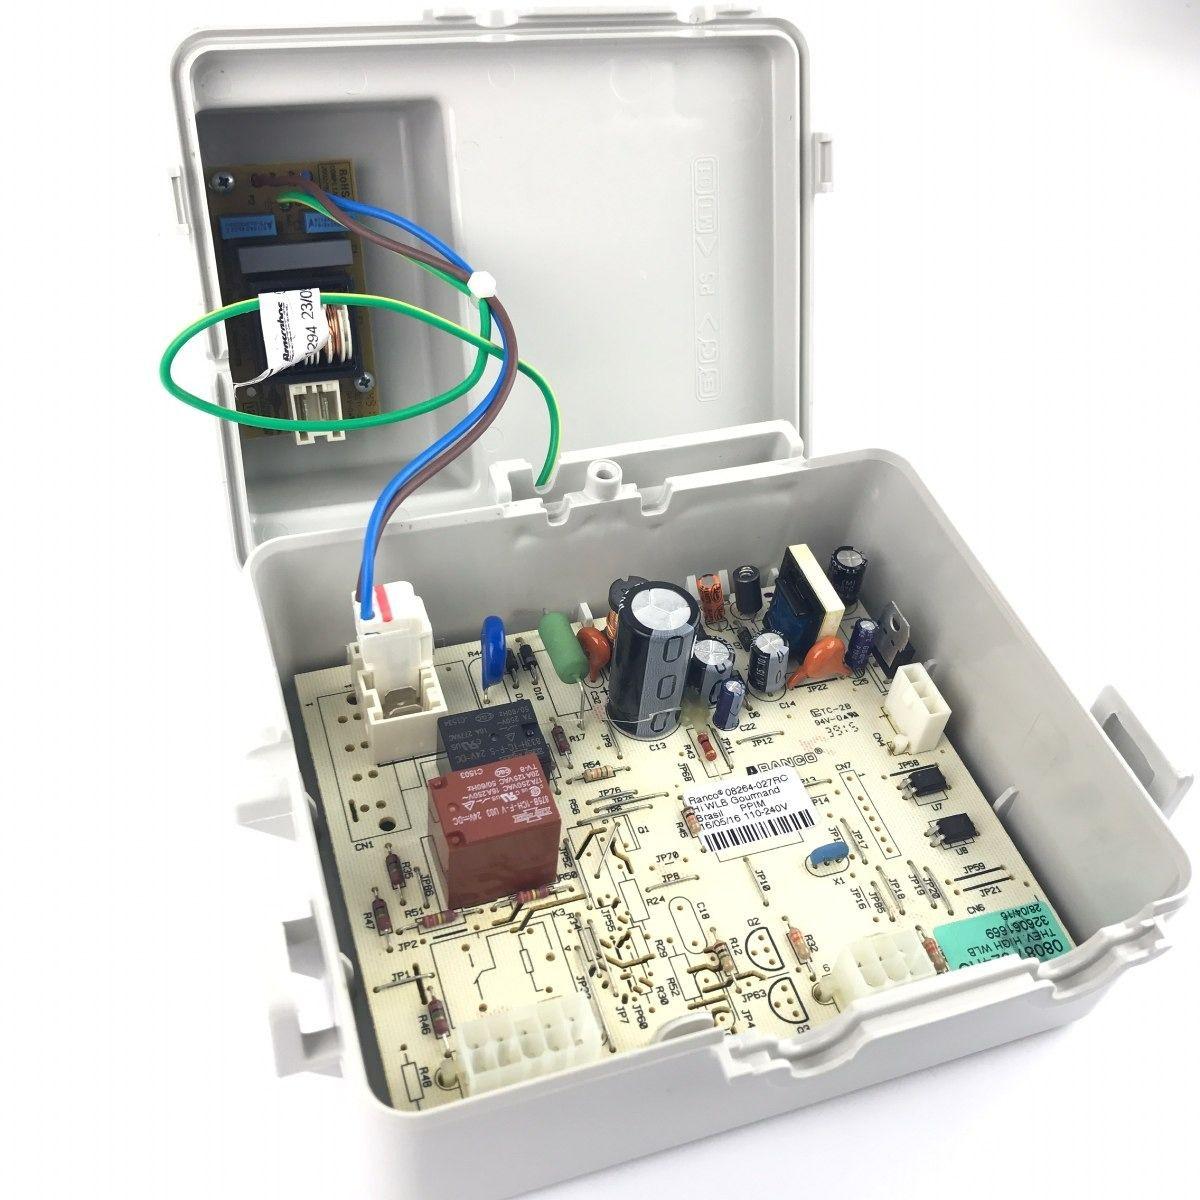 Conjunto Placa de Controle Thevenin para Geladeira - Brastemp